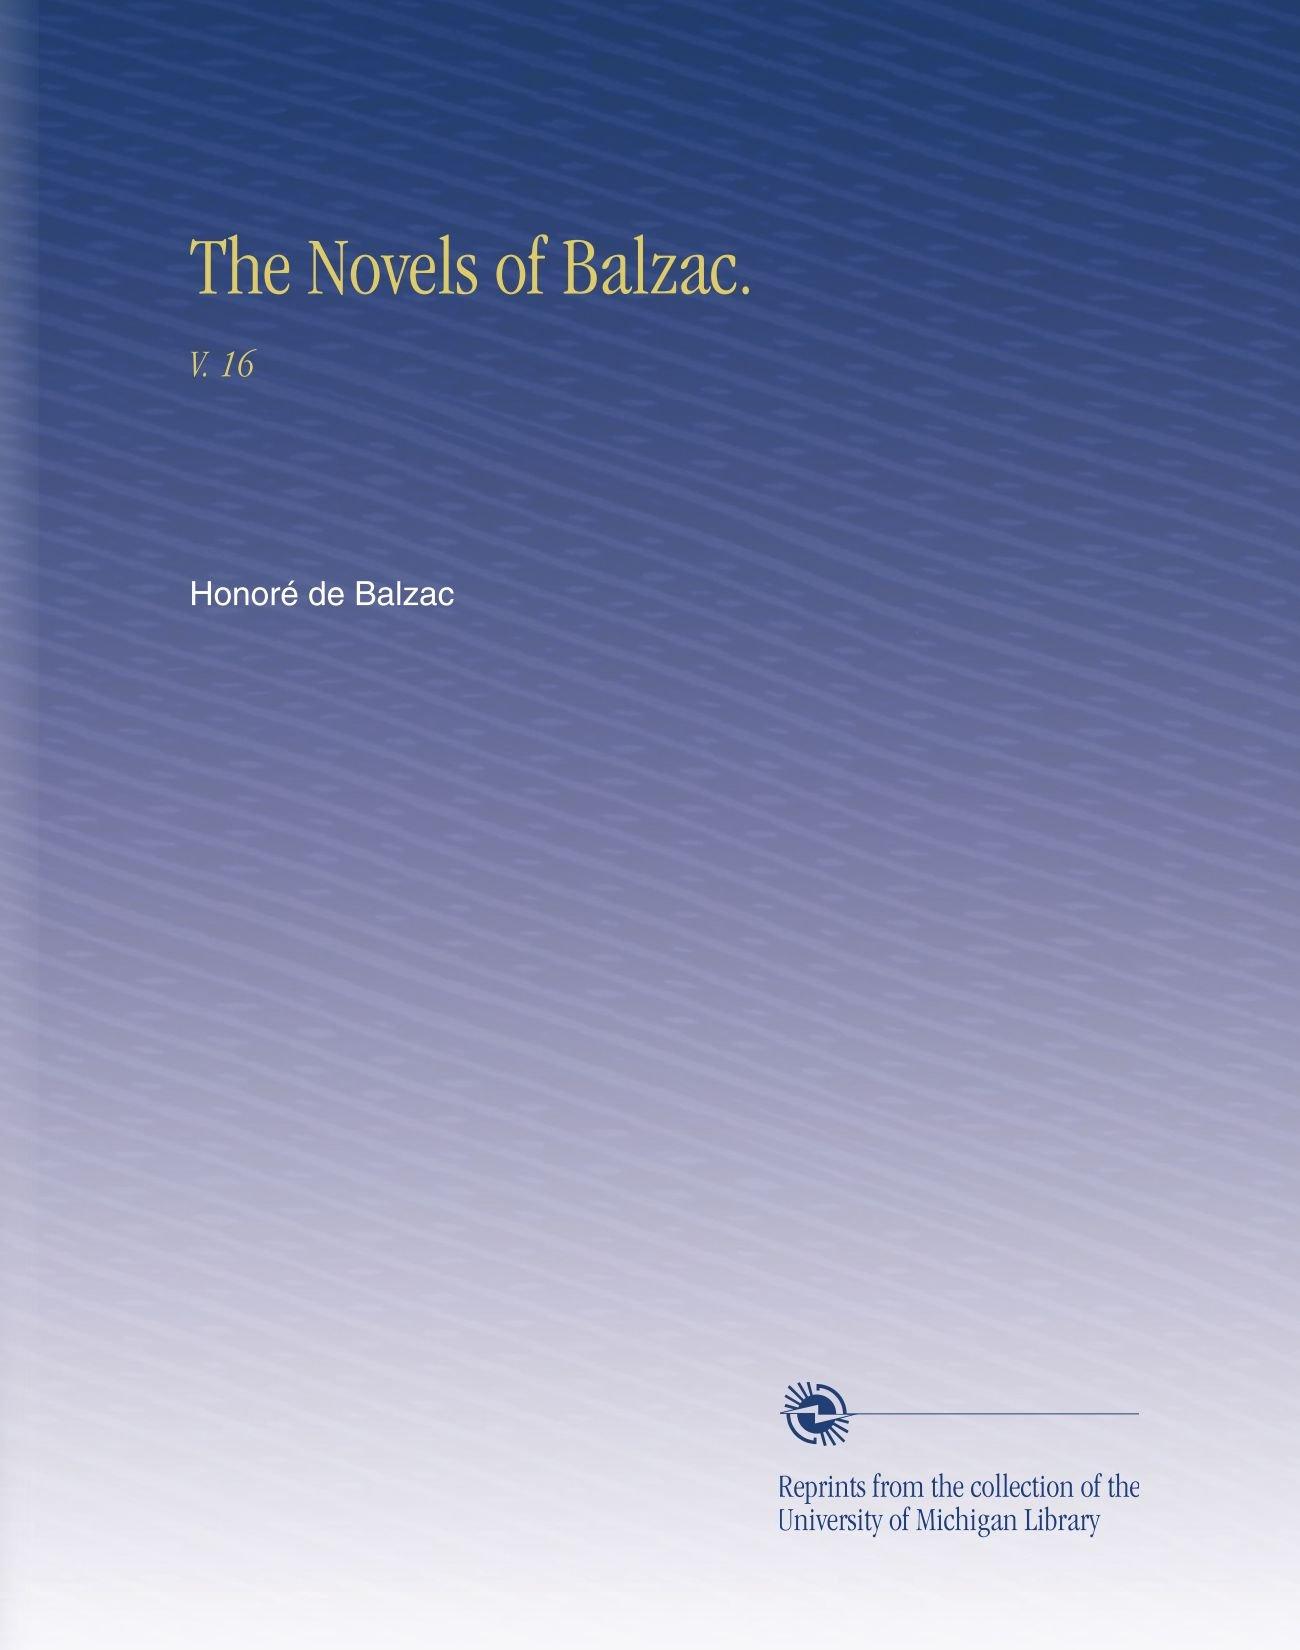 Download The Novels of Balzac.: V. 16 pdf epub